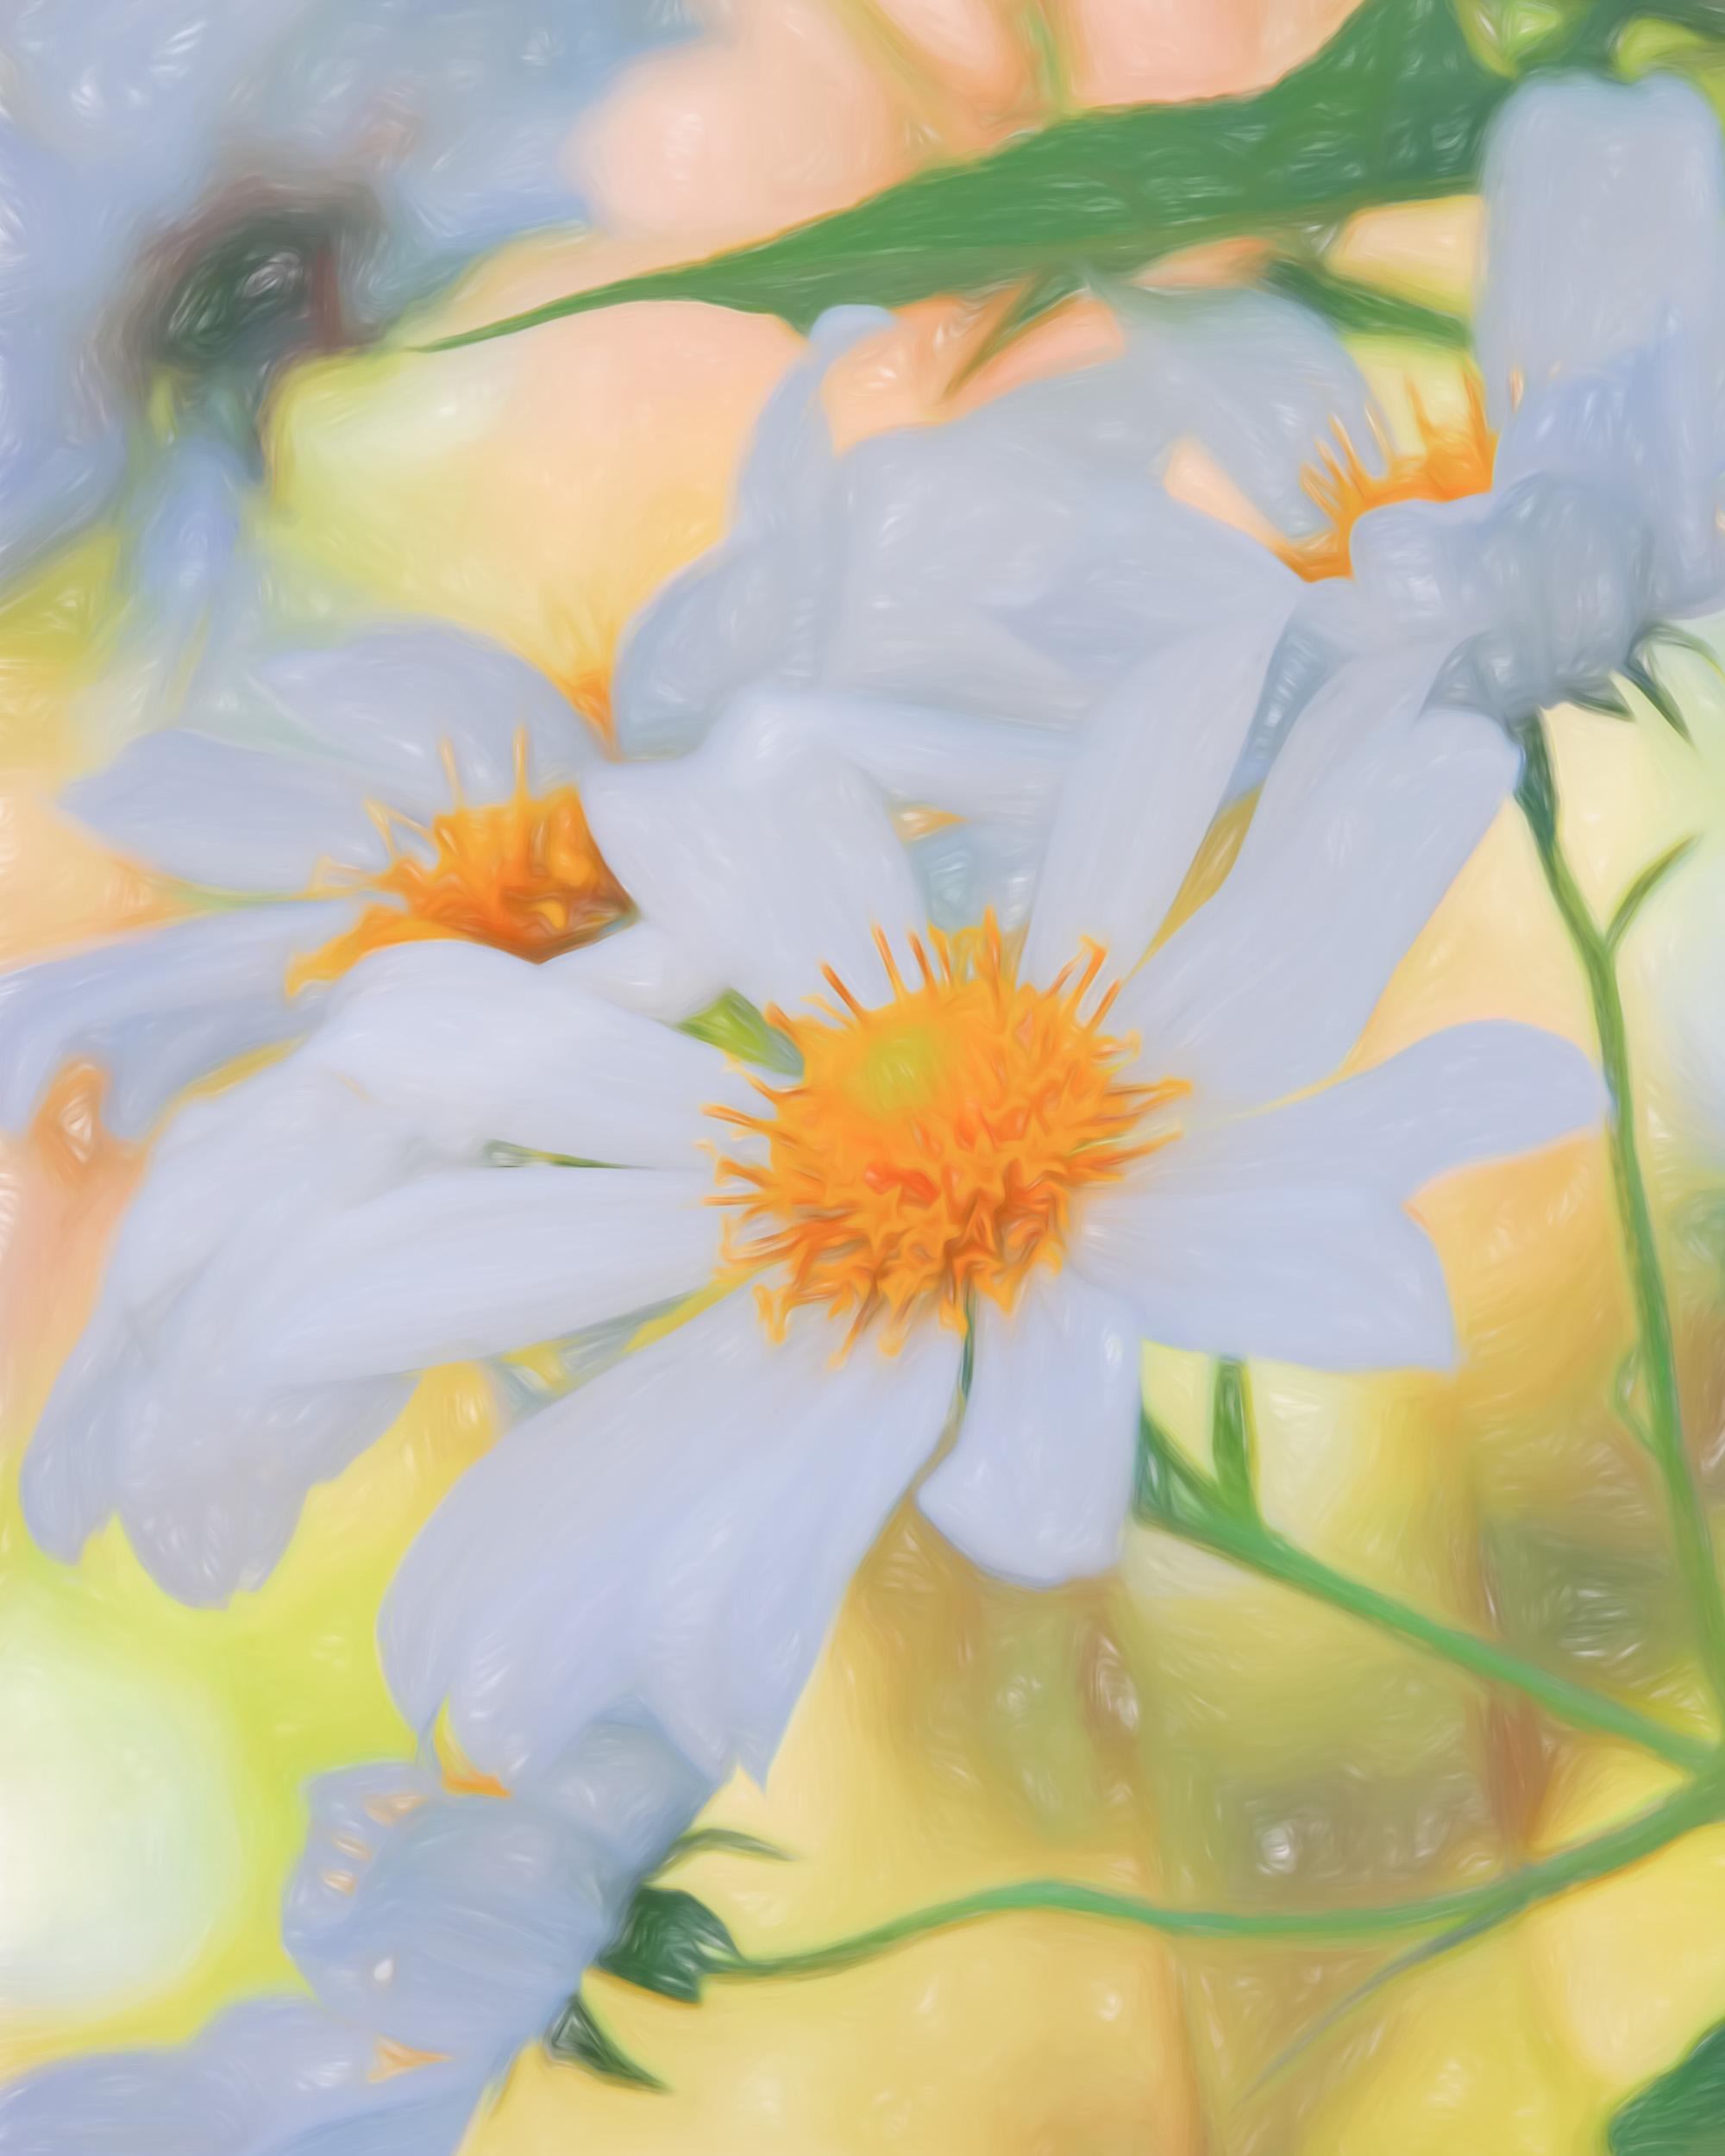 """Garden Daisy Portrait"" - Photography Artist Kevin Sibbitt"